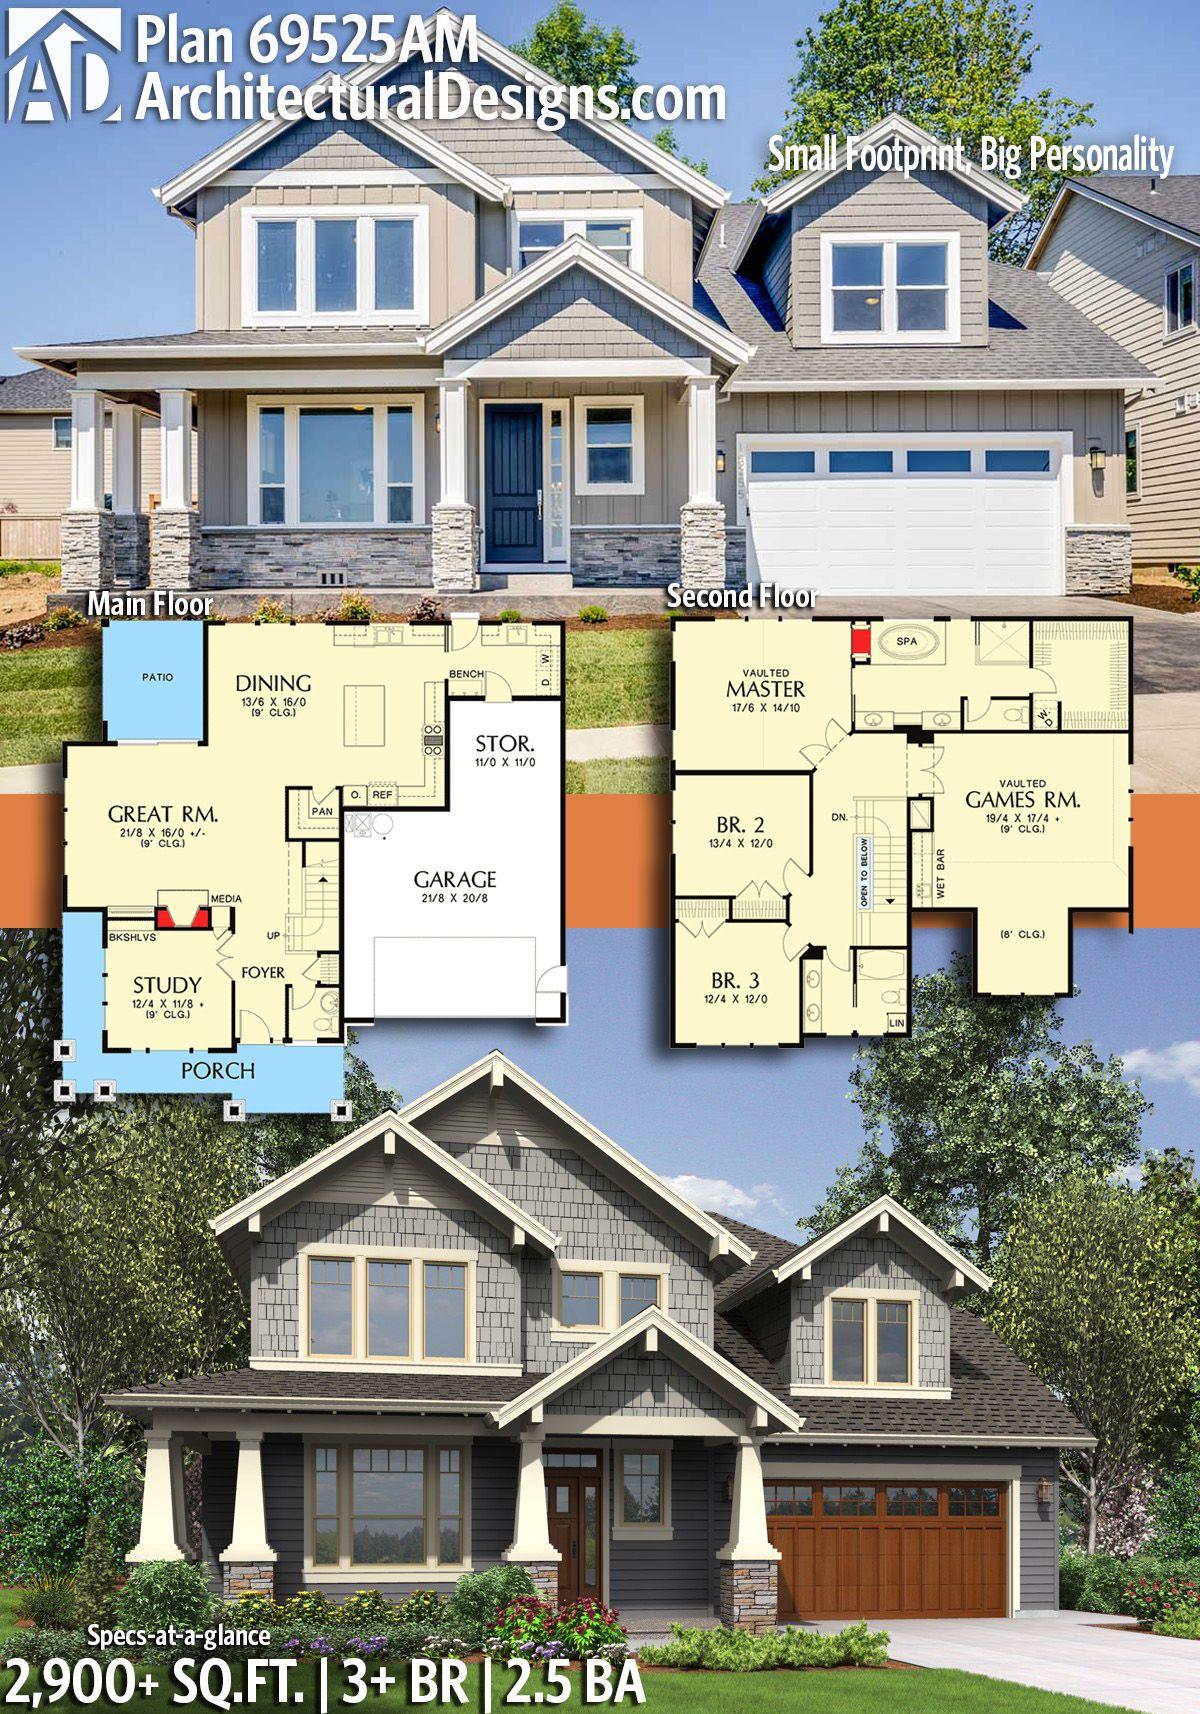 Plan 69525am Small Footprint Big Personality Craftsman House Plans Family House Plans New House Plans